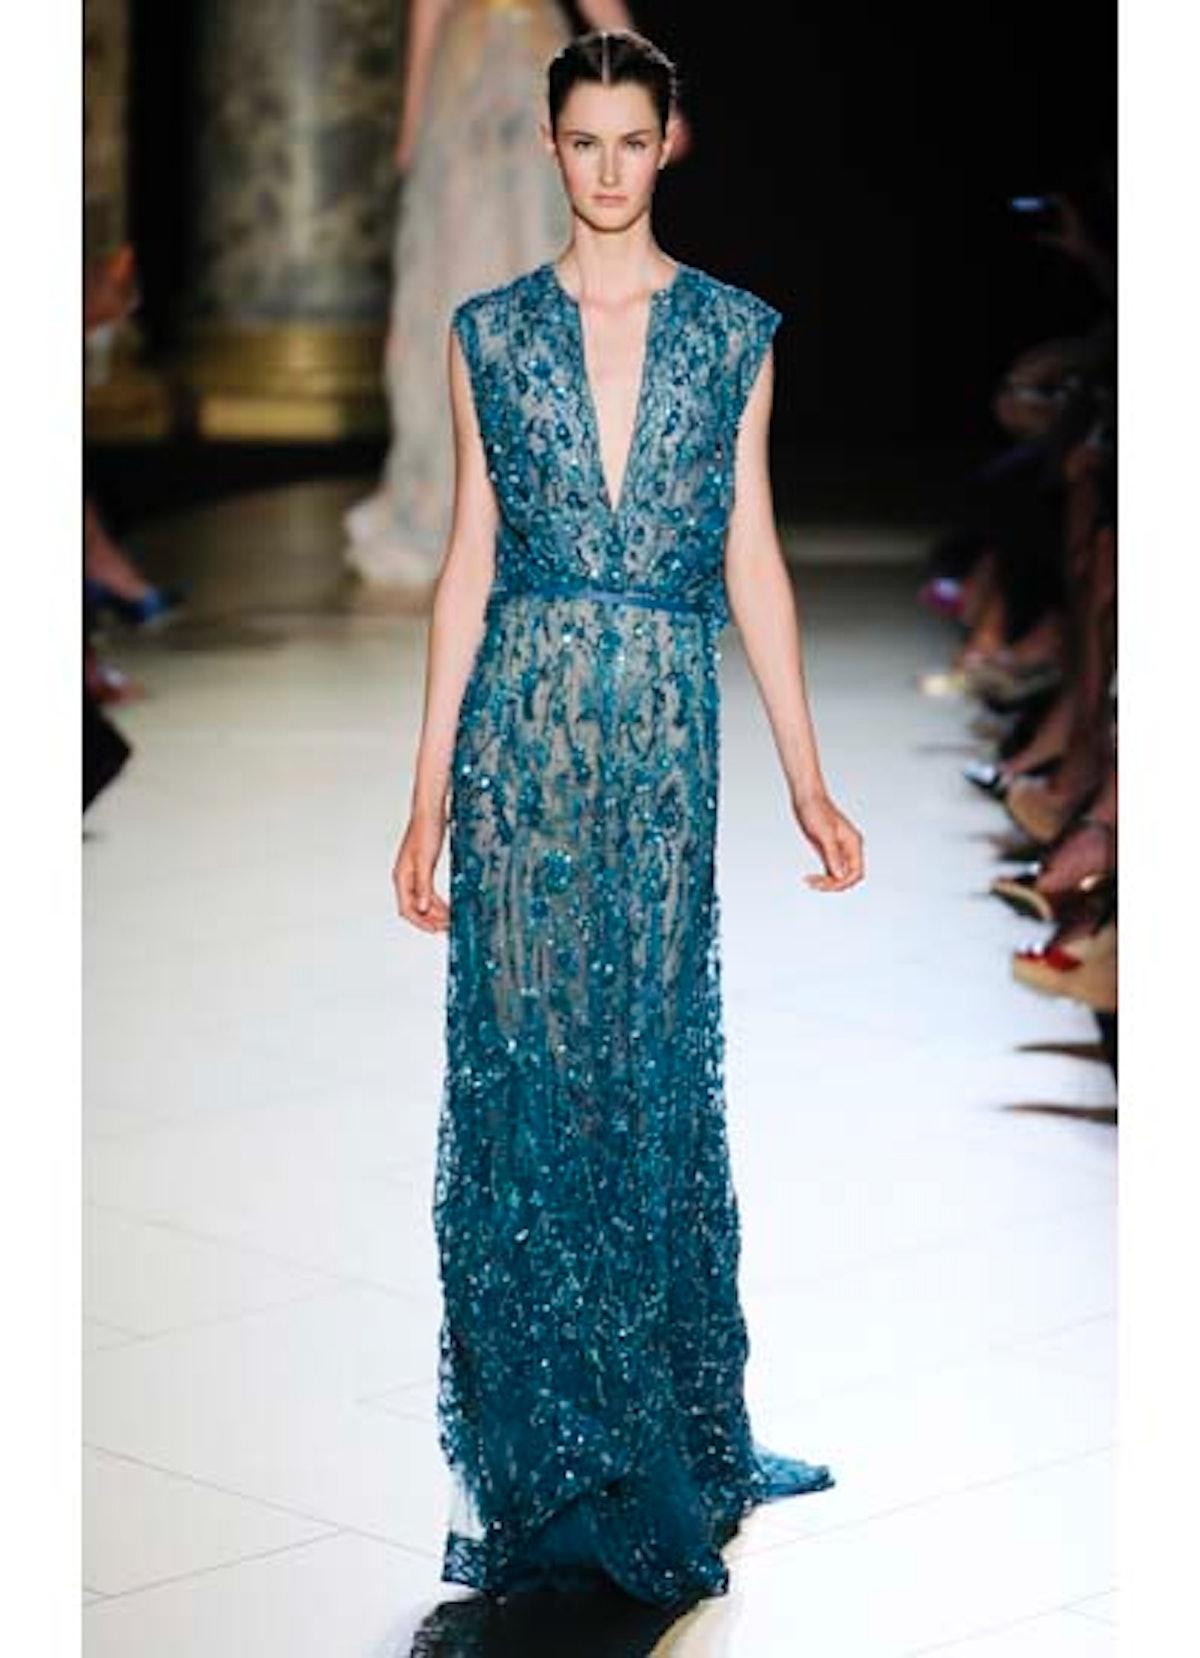 fass-elie-saab-couture-2012-runway-29-v.jpg